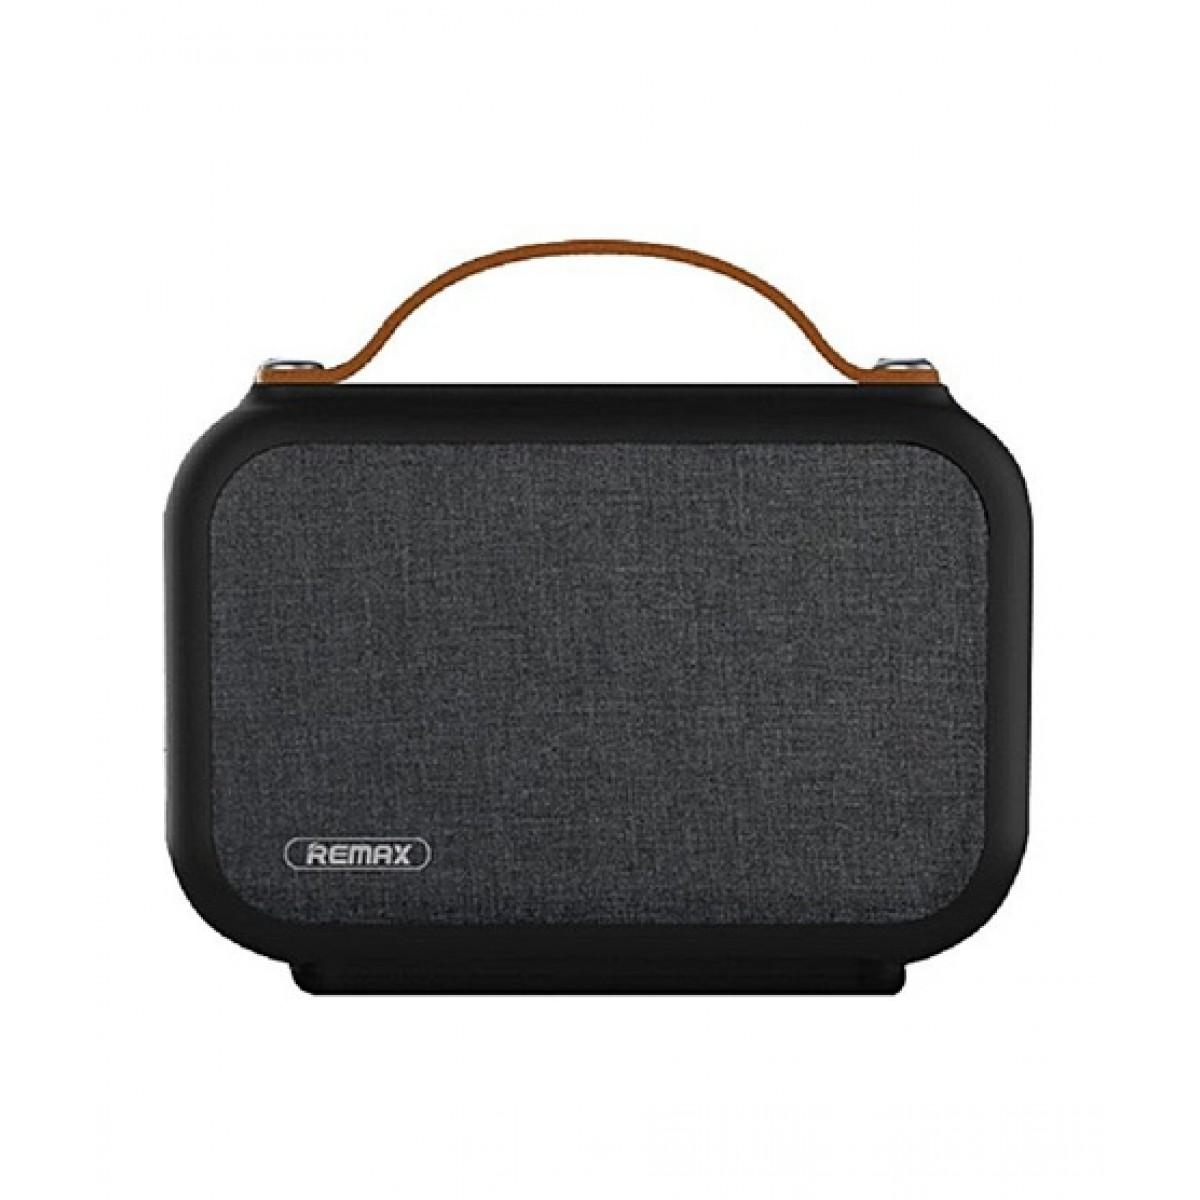 Remax Fabric Portable Wireless Speaker Black (RB-M17)